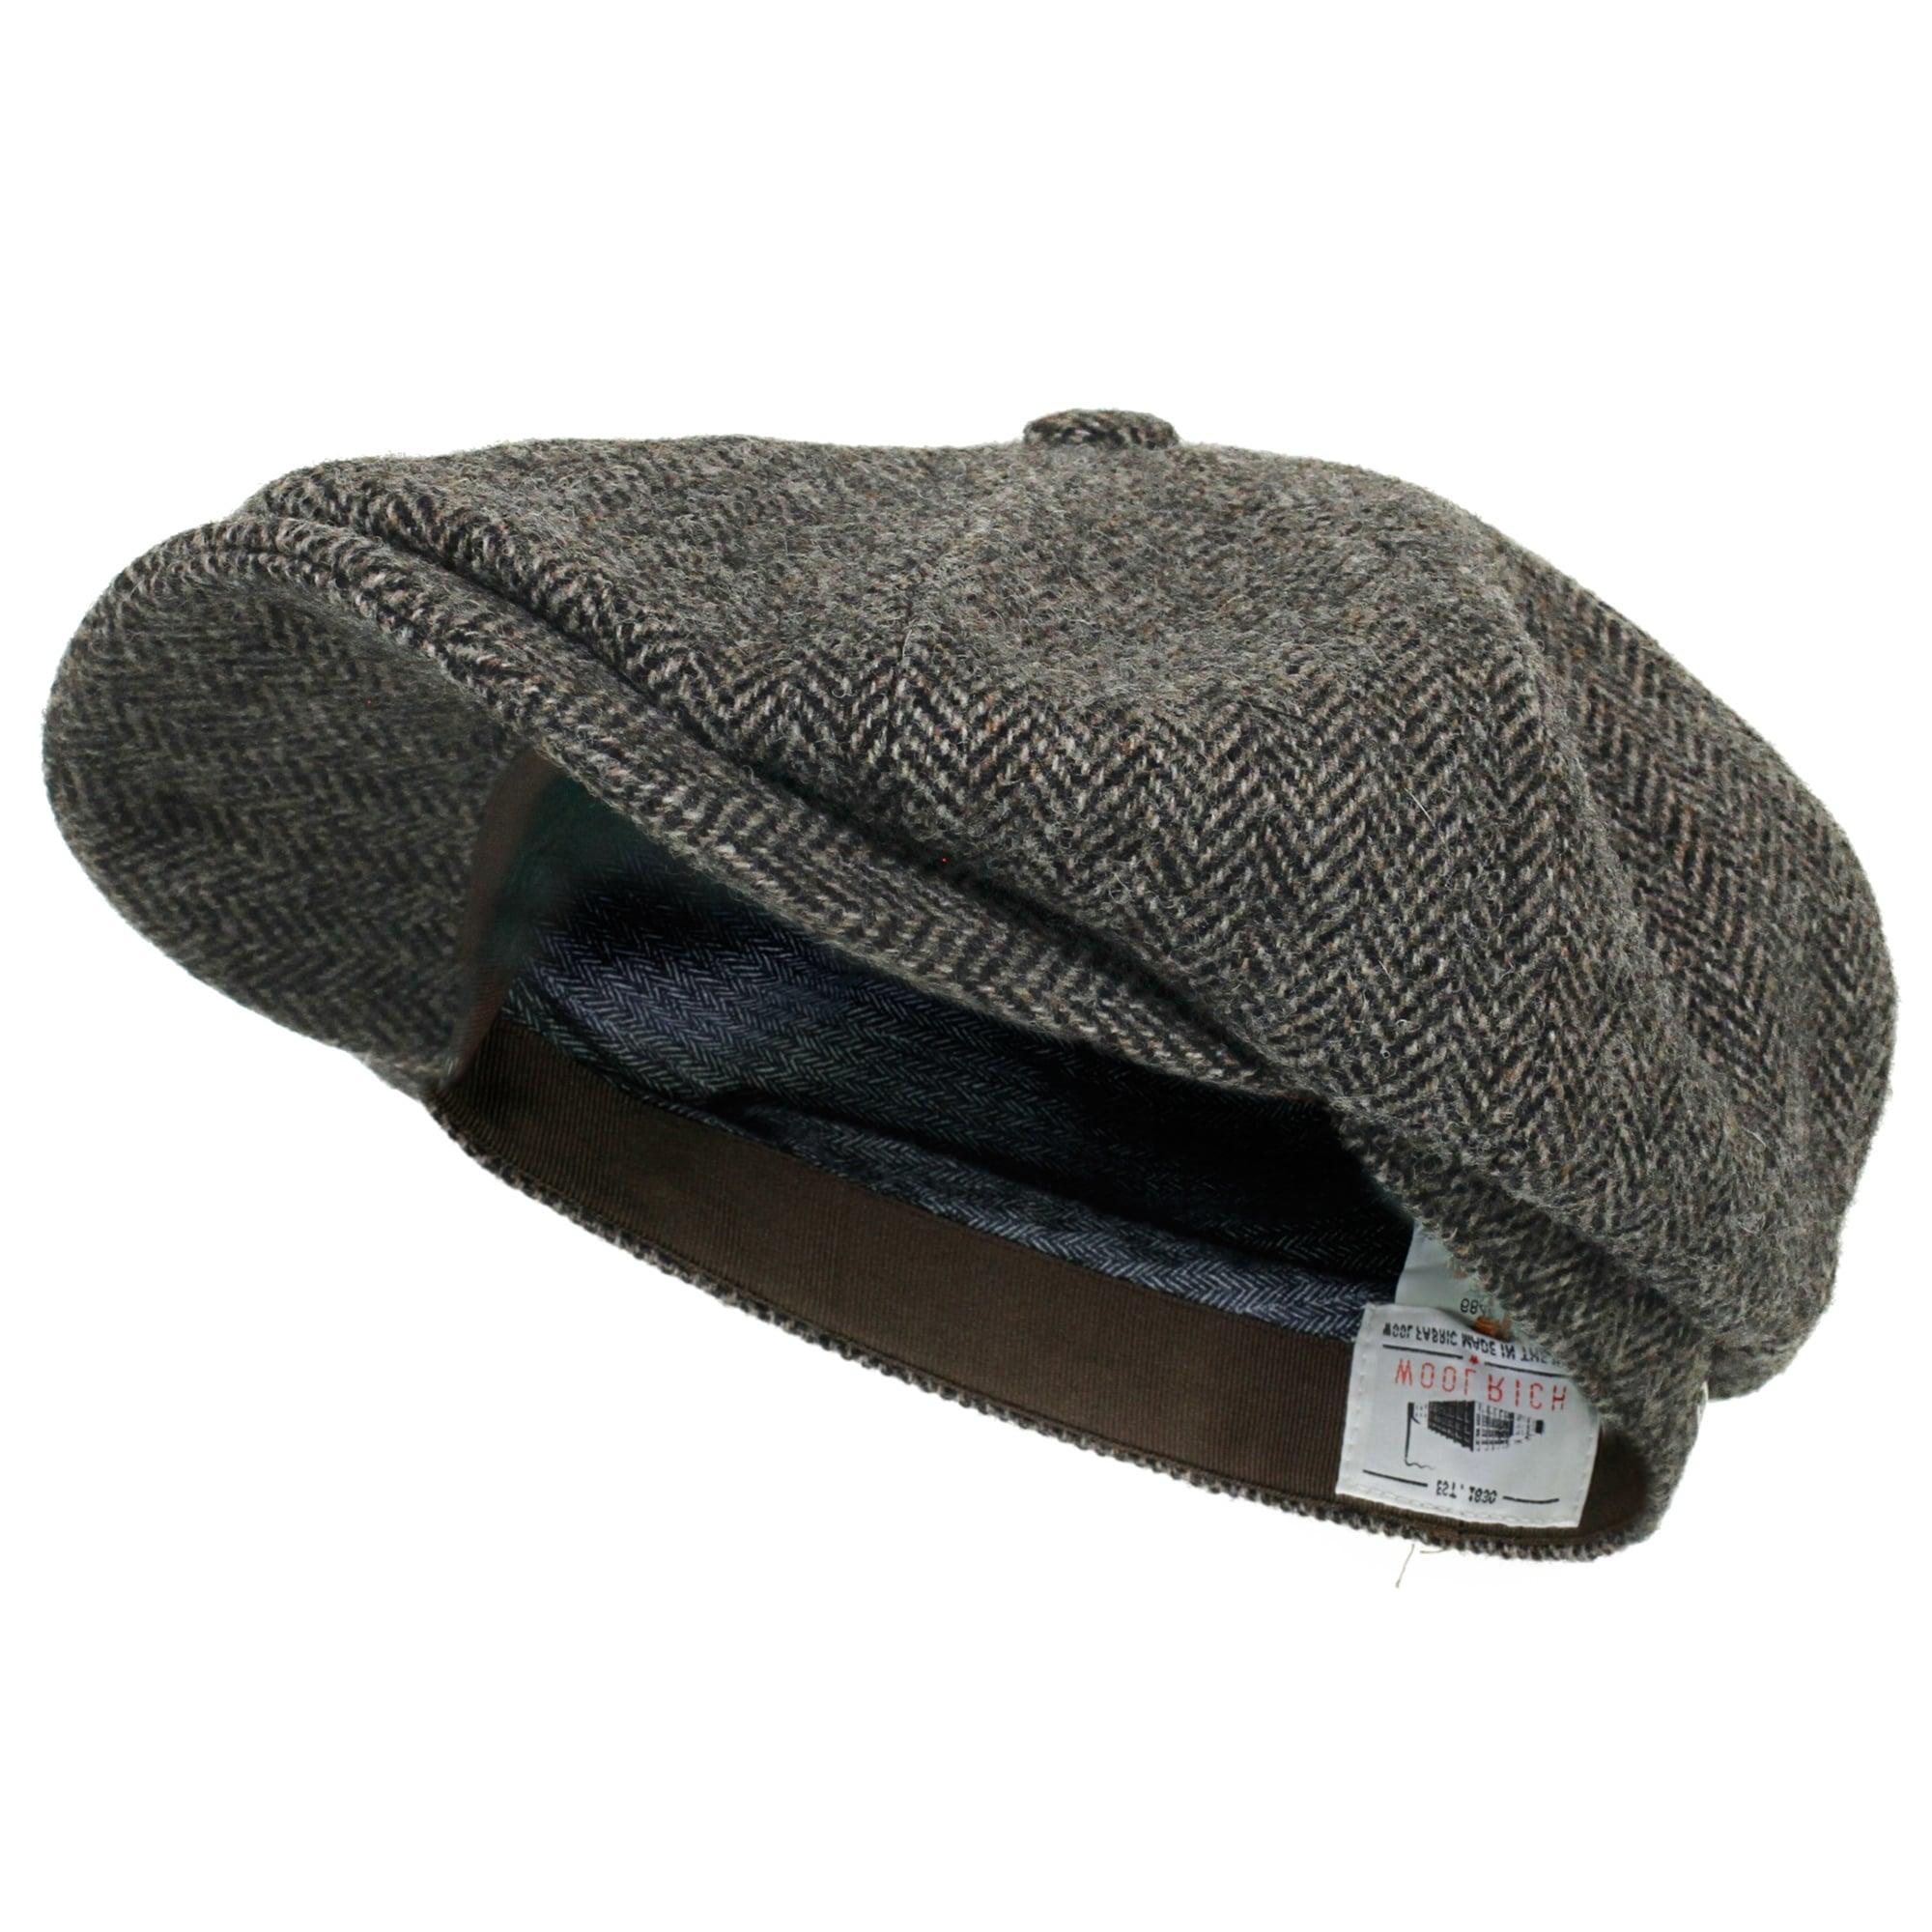 Stetson Hatteras Woolrich Herringbone Grey Newsboy Hat 6840514 333 60b57412378